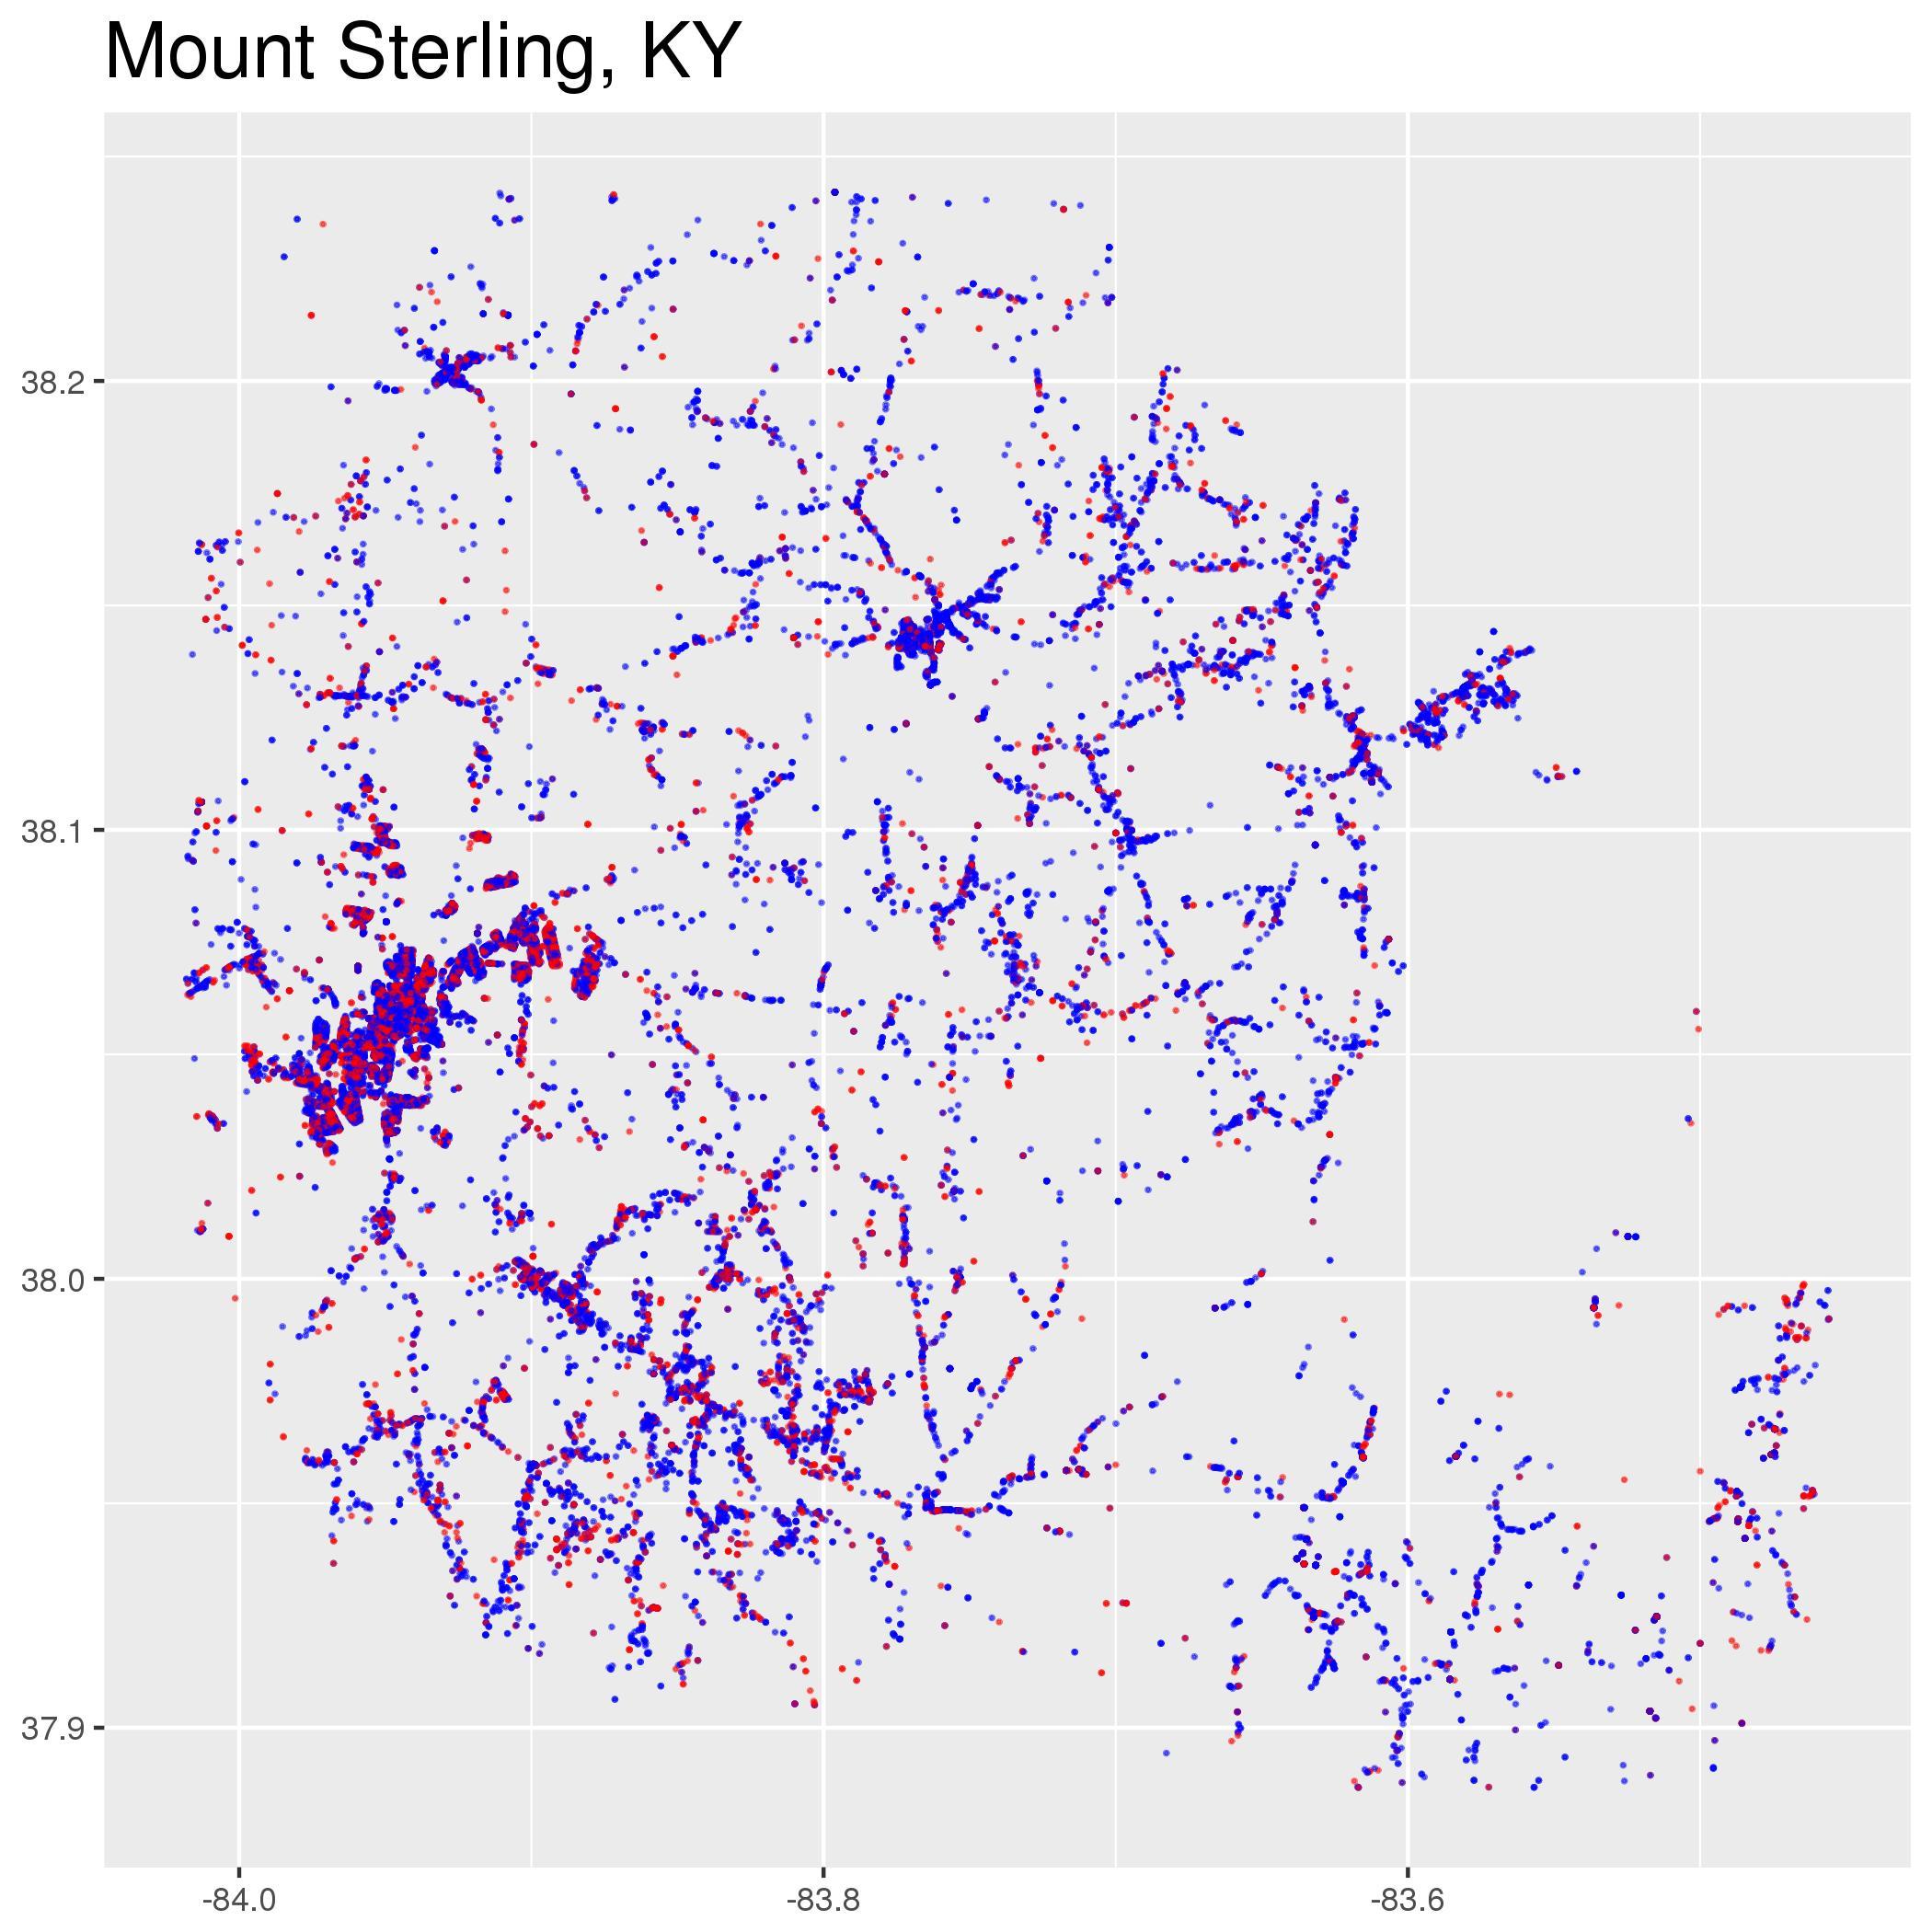 MountSterlingKY.jpeg